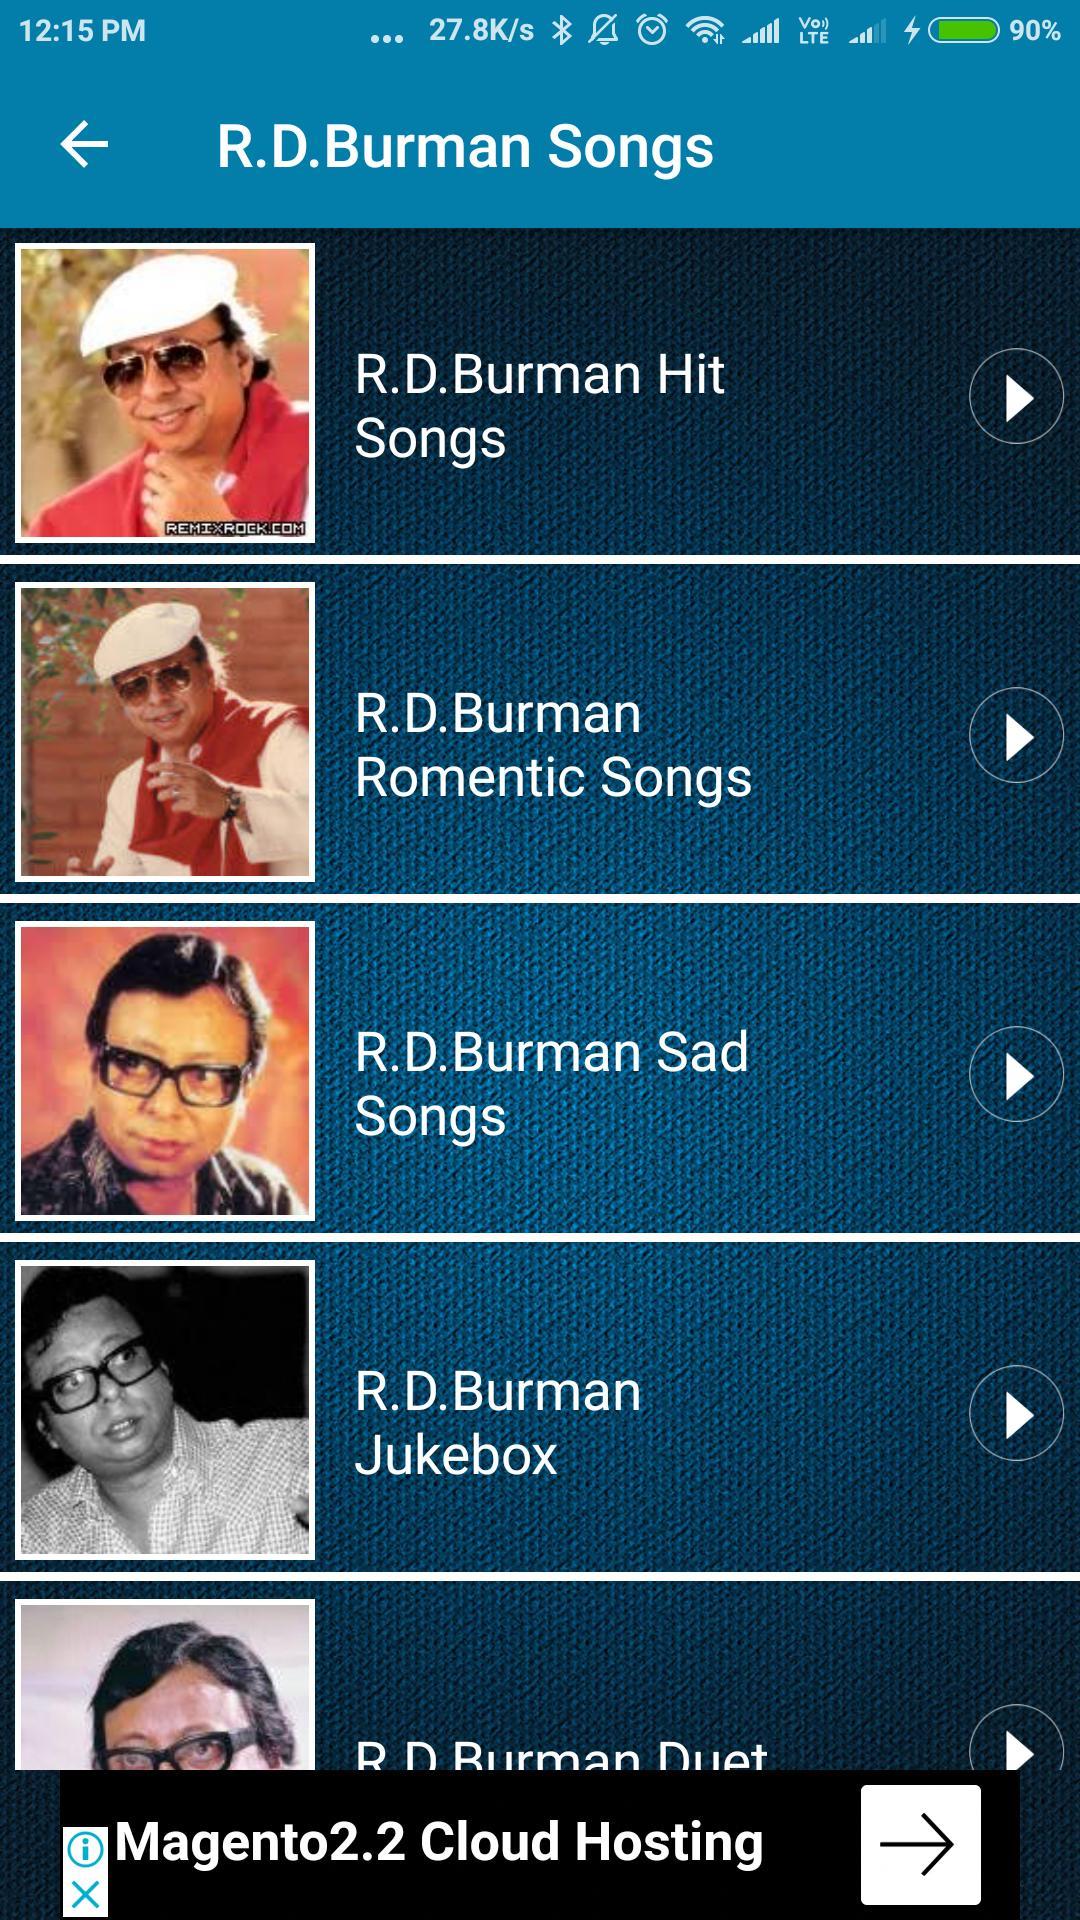 rd burman remix songs download